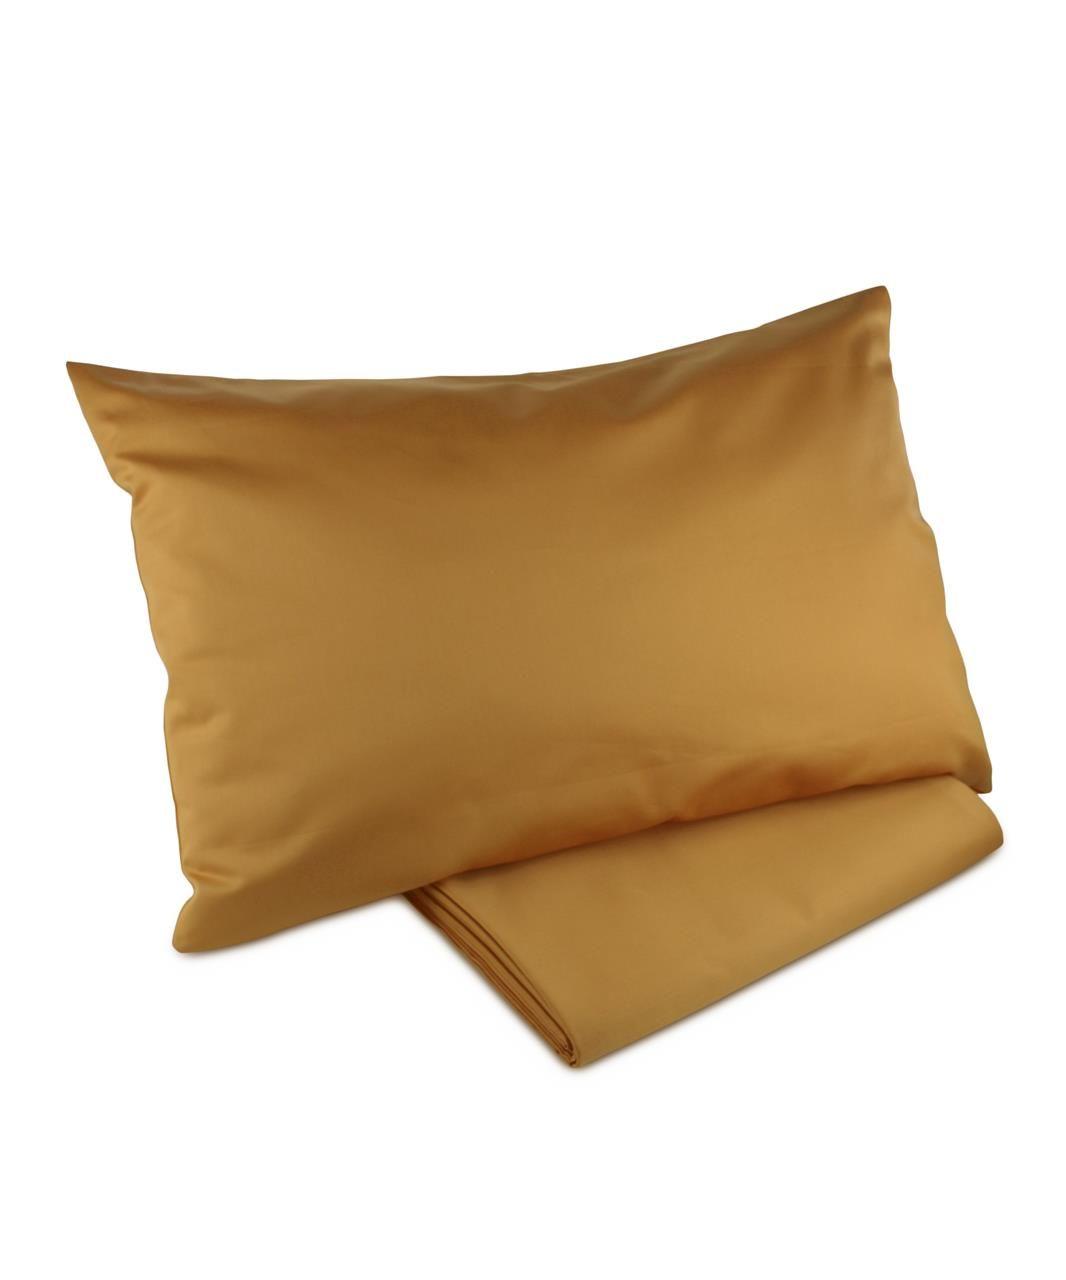 e6068e22097 Finest Sateen Saffron Gold organic cotton bedding